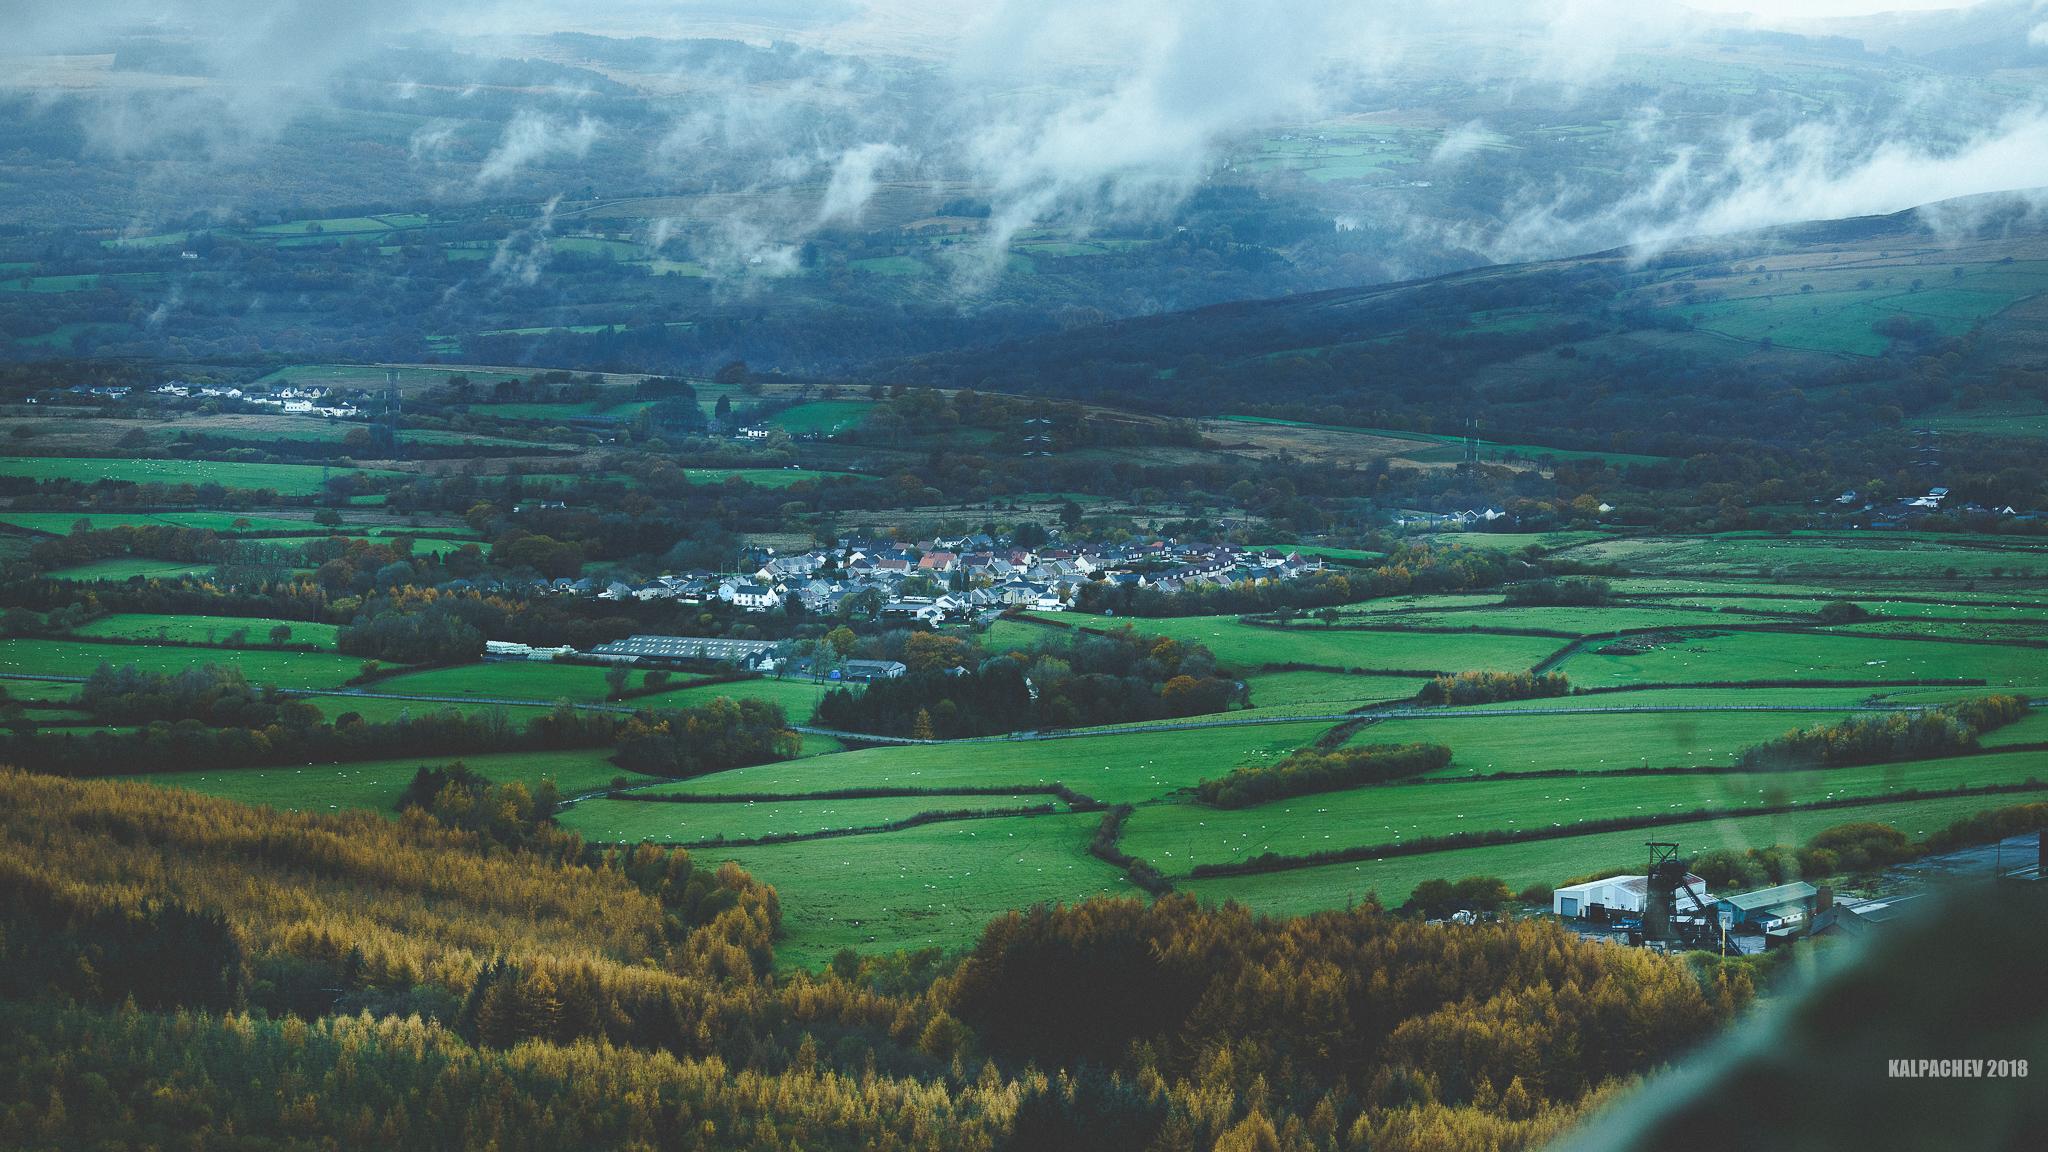 Rhigos – Rhondda valleys, Wales